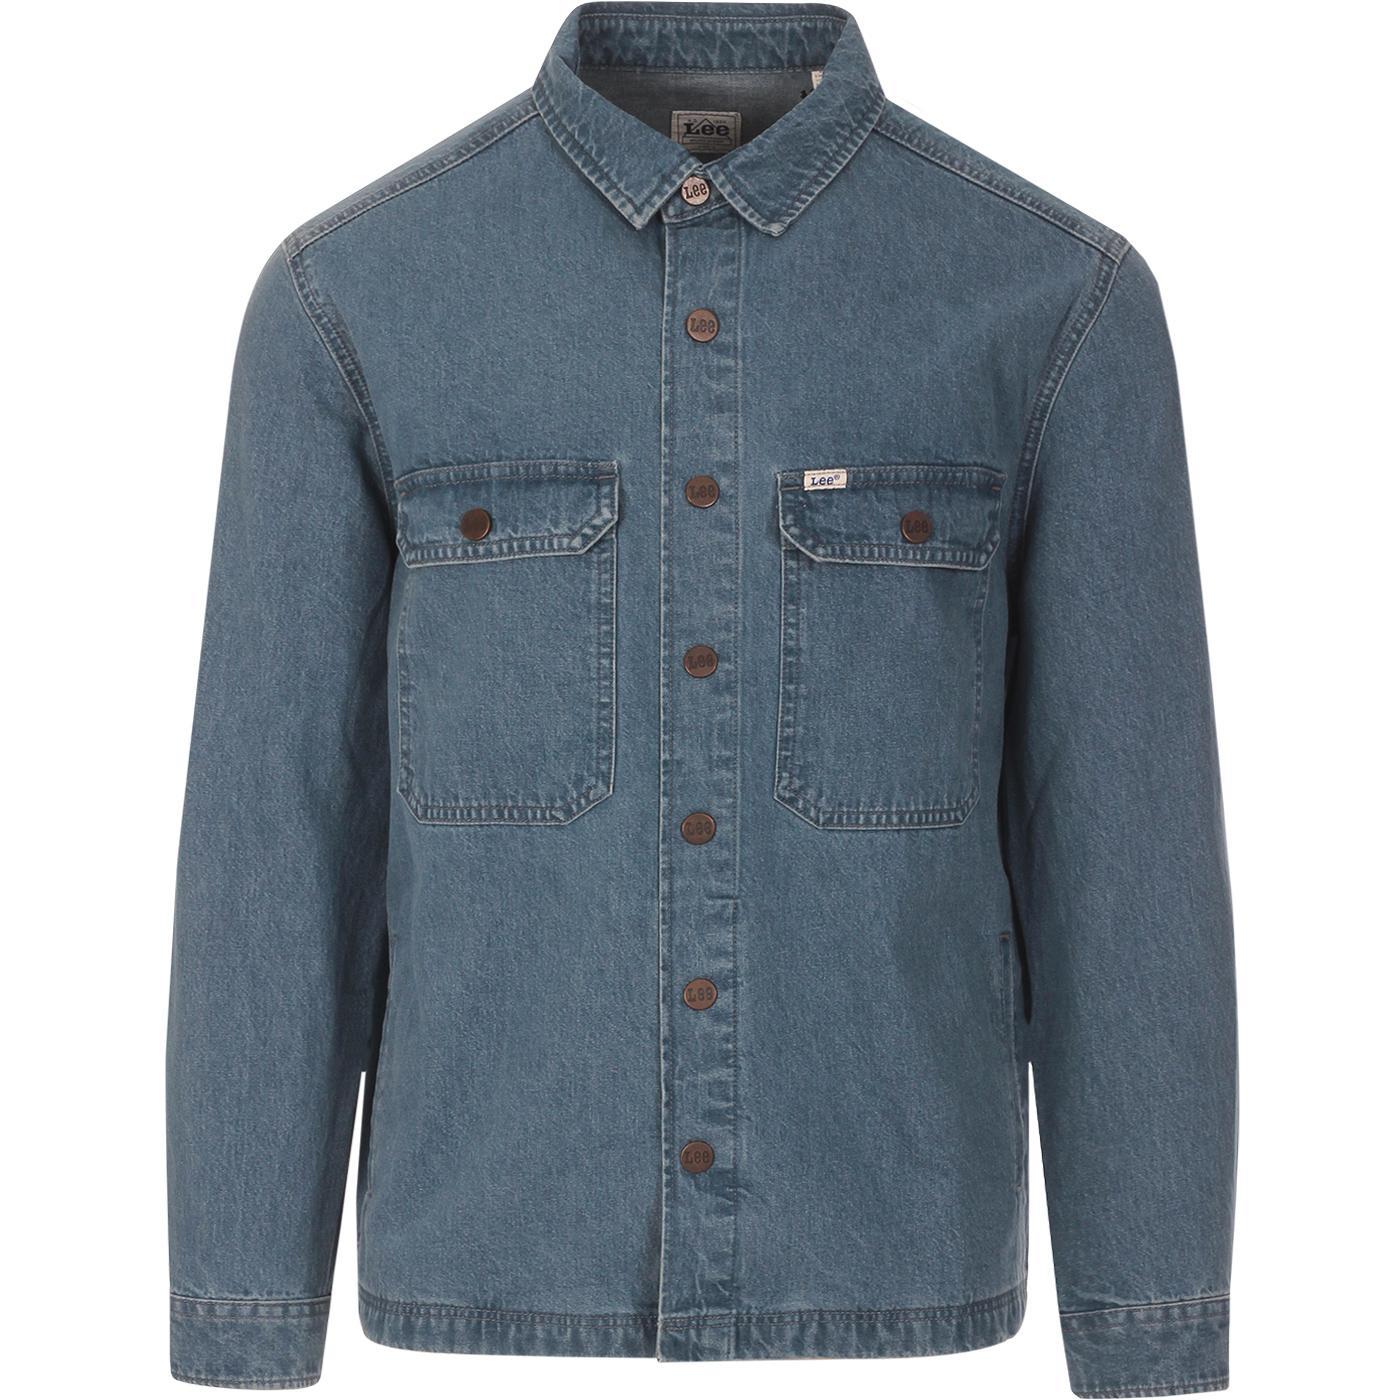 LEE JEANS Retro Mod Denim Workwear Overshirt